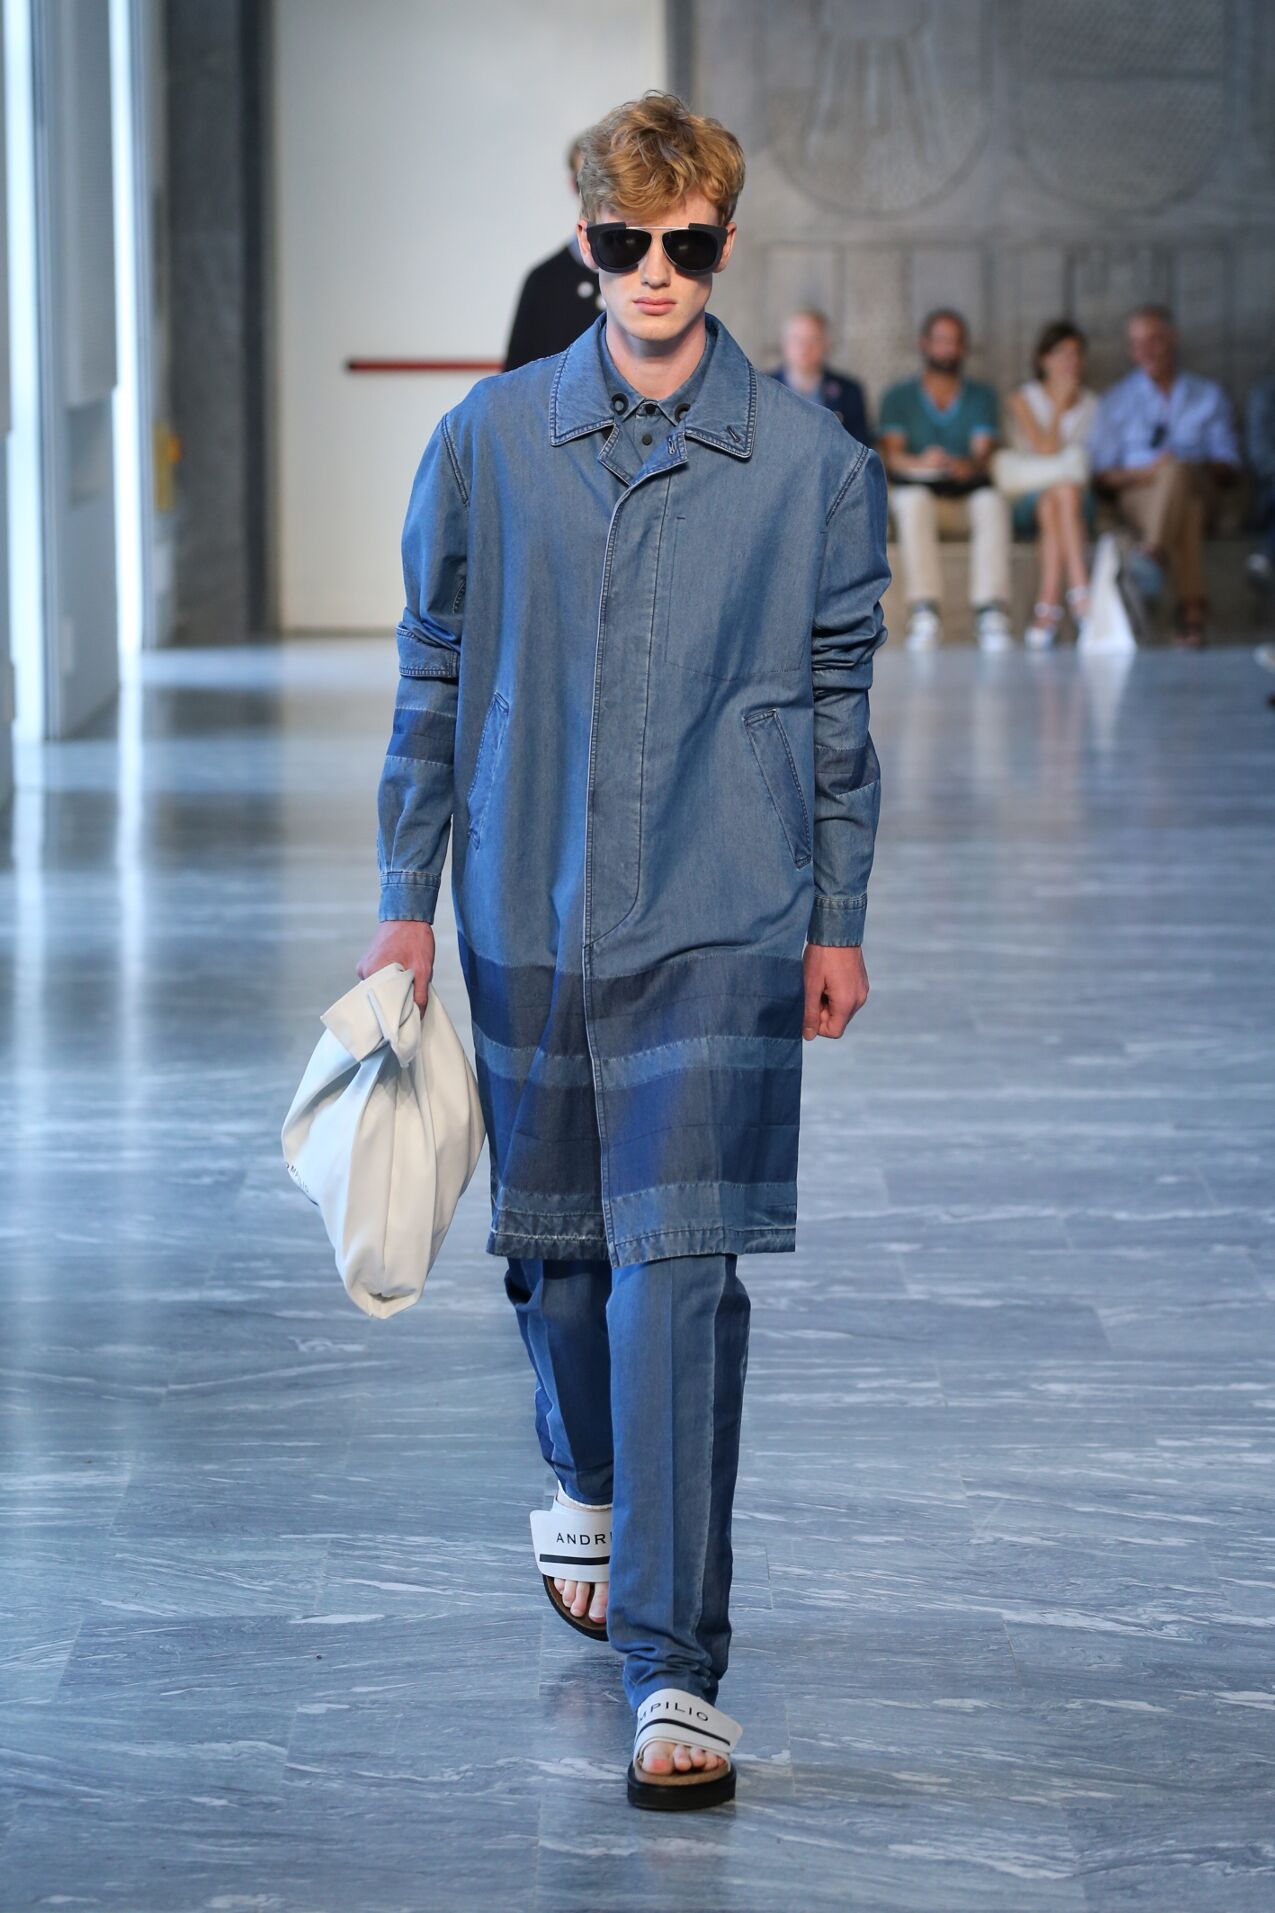 Summer Andrea Pompilio Trends 2015 Man